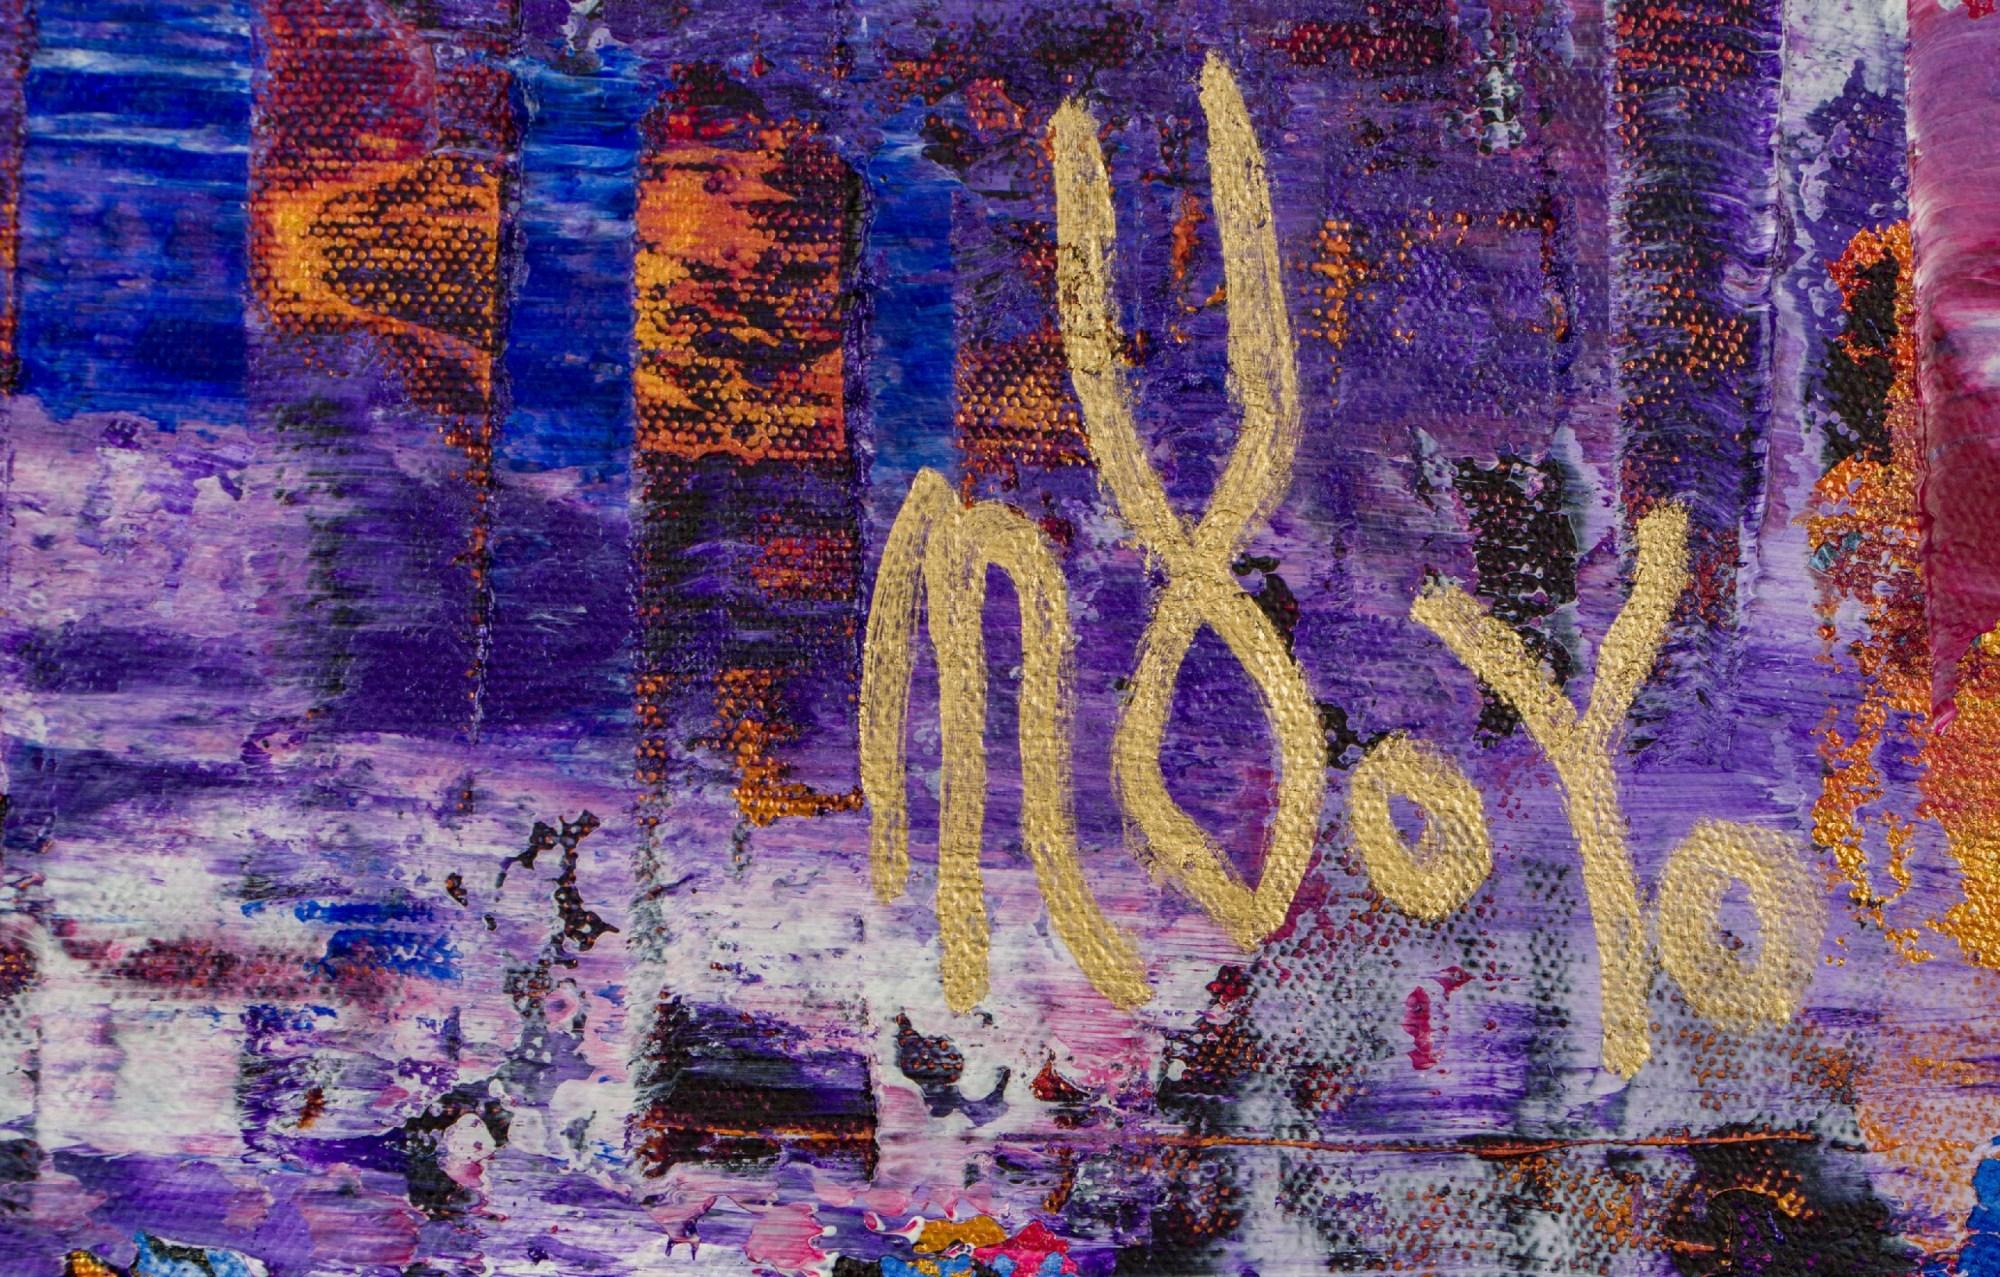 Signature - Chaos and Lights 2 (2020) by Nestor Toro